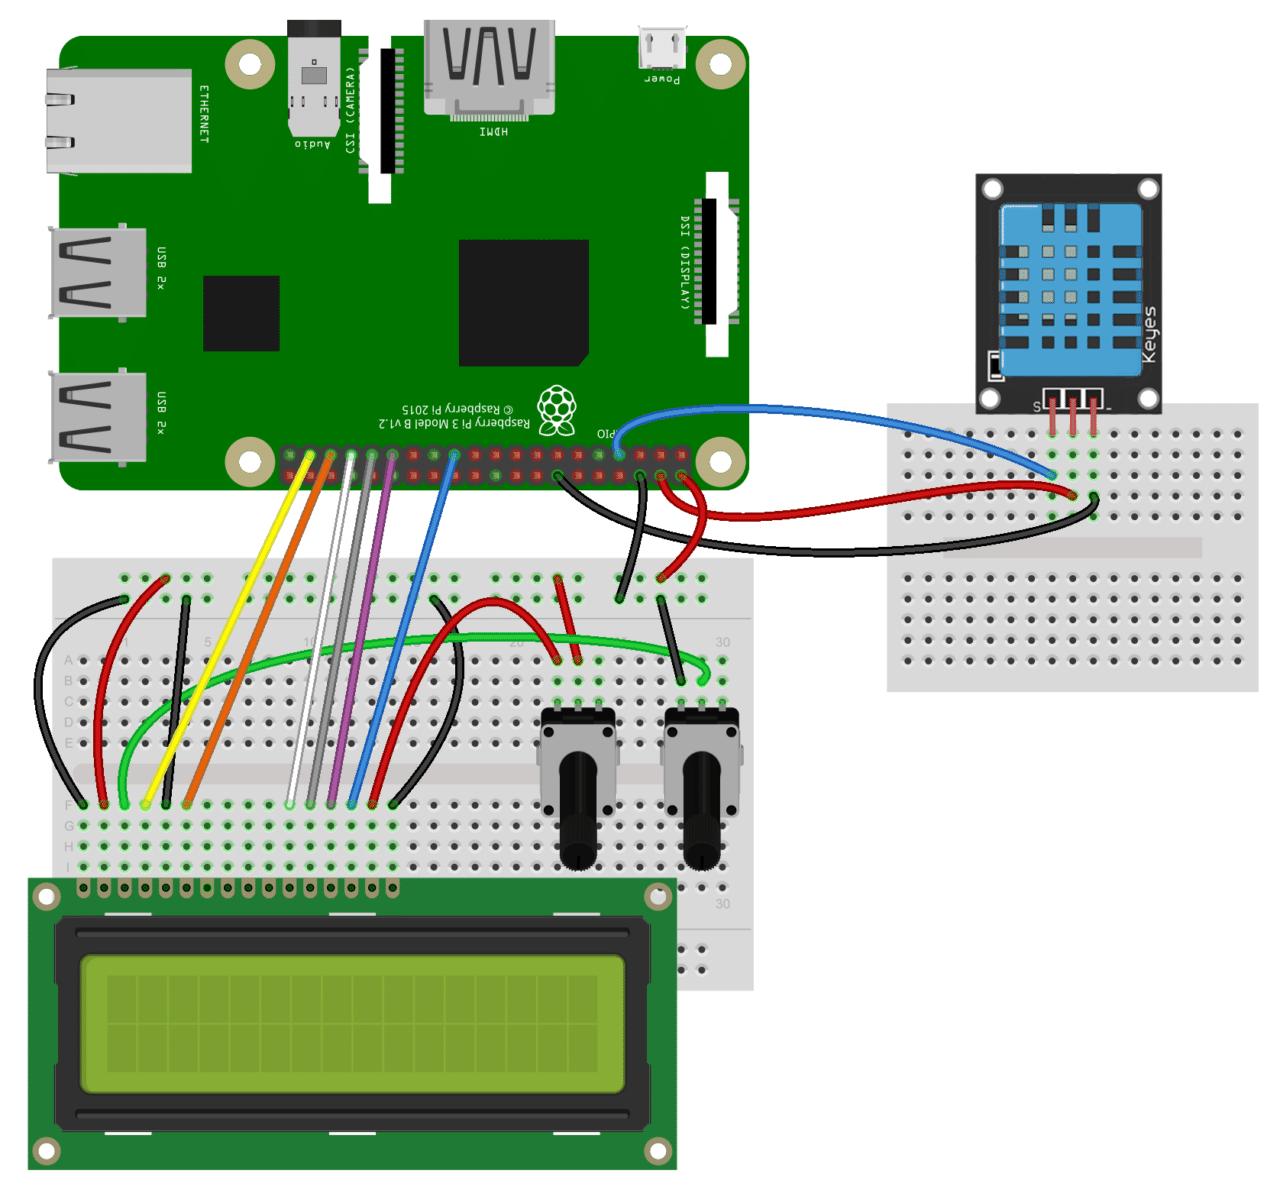 hight resolution of how to set up the dht11 humidity sensor on the raspberry pi raspberry pi sensor kit dht11 wiring raspberry pi